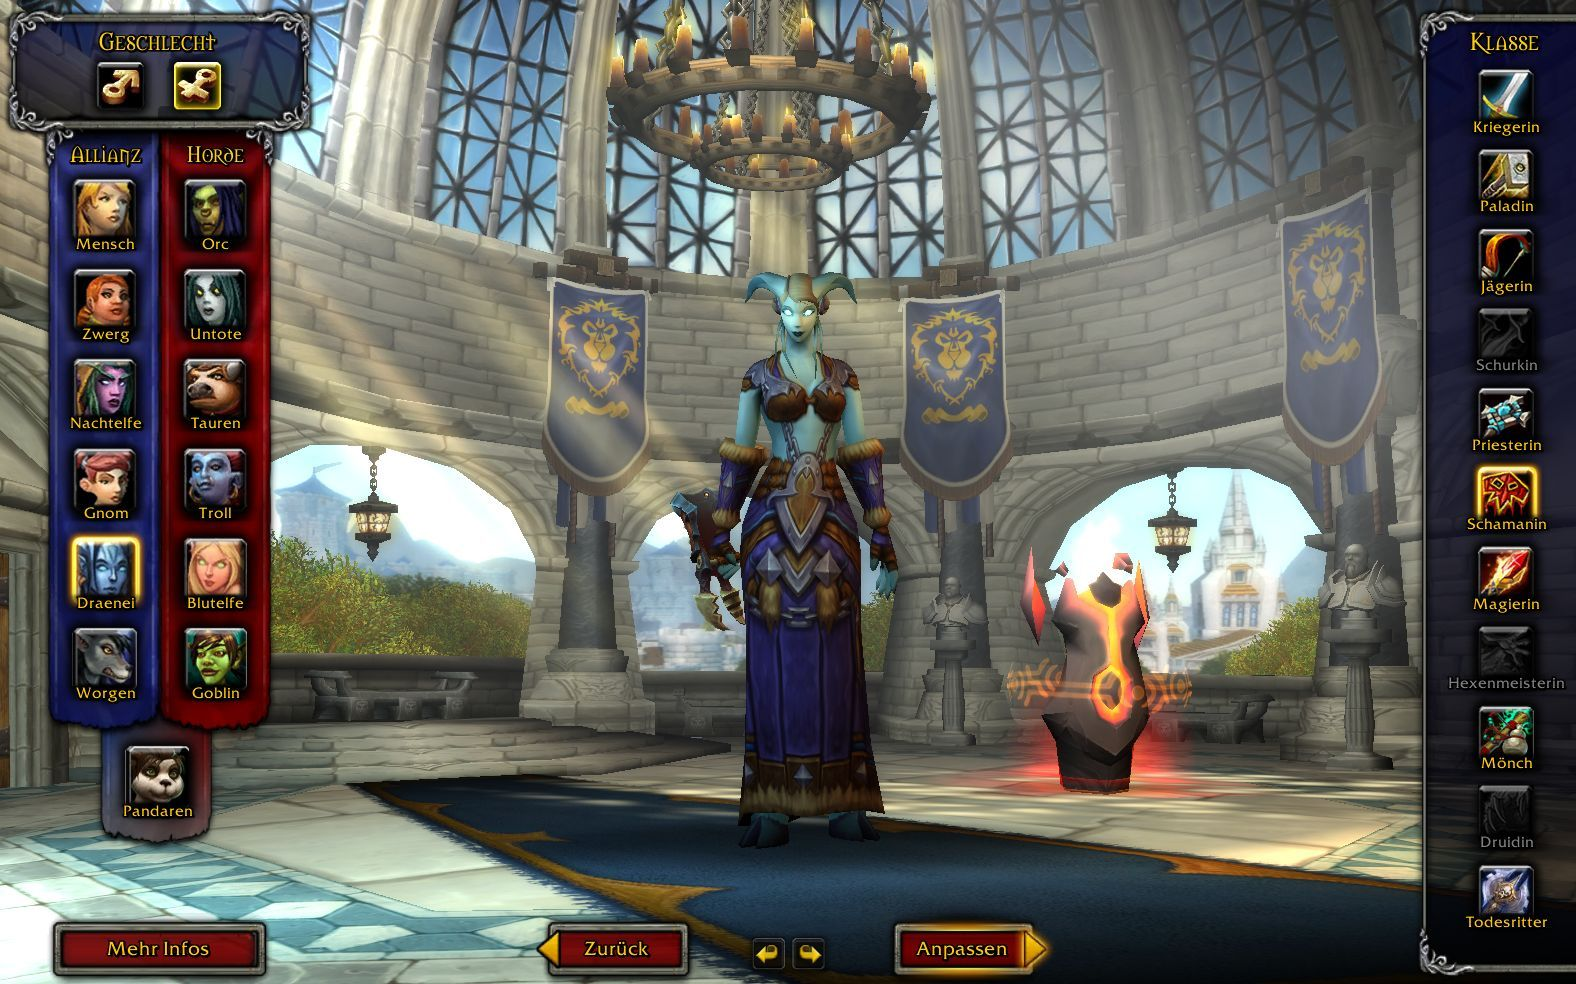 Новый экран создания персонажа для Альянса, награды за репутацию с